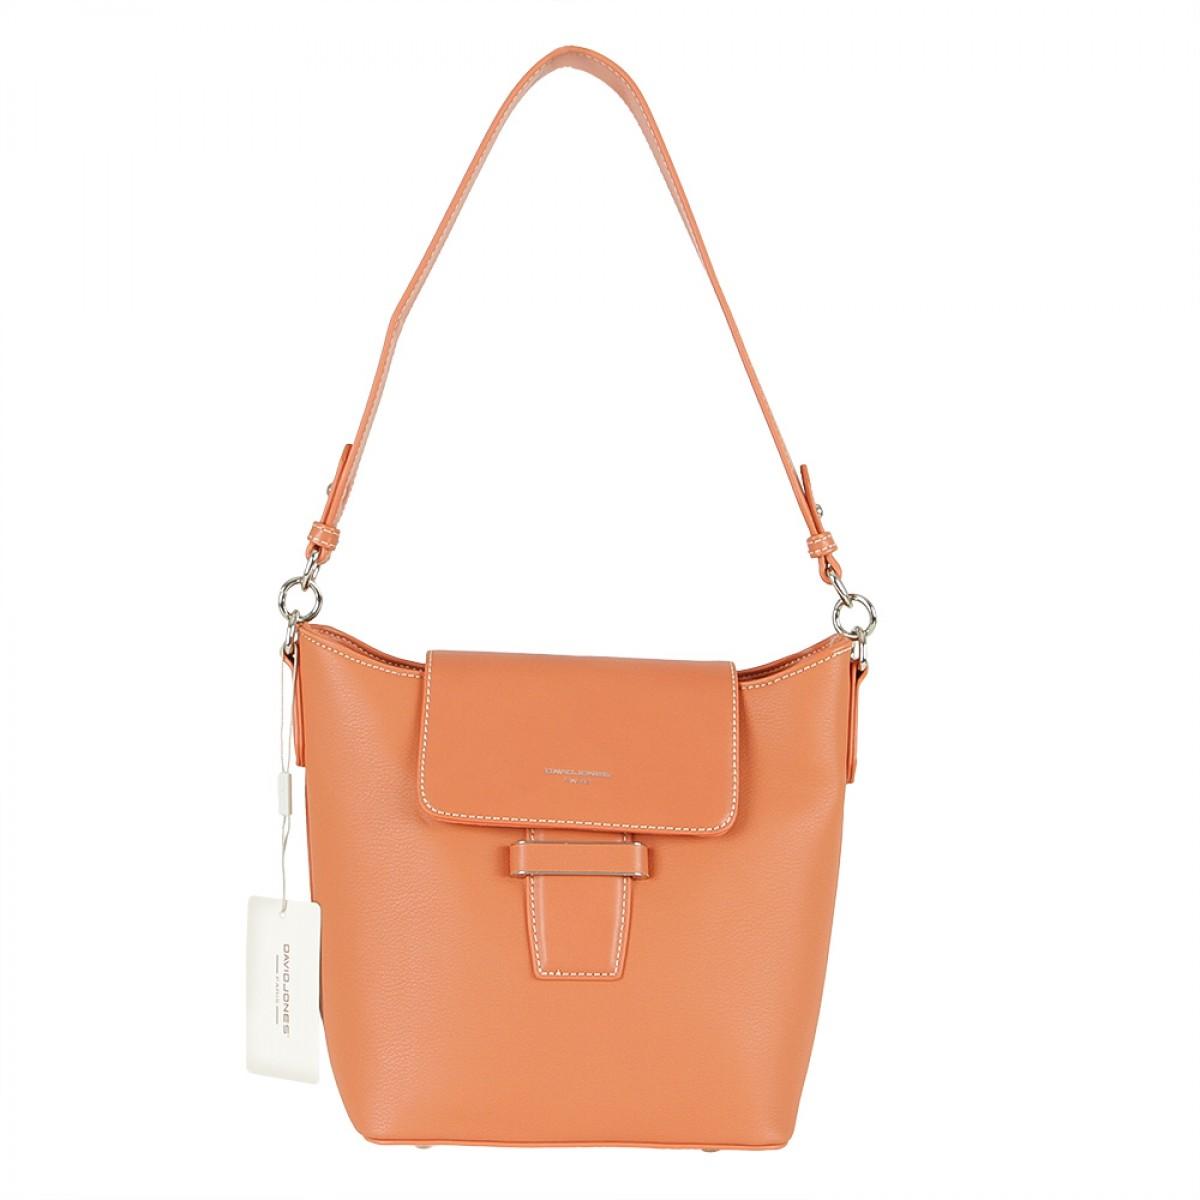 Жіноча сумка David Jones 6211-2 CORAL